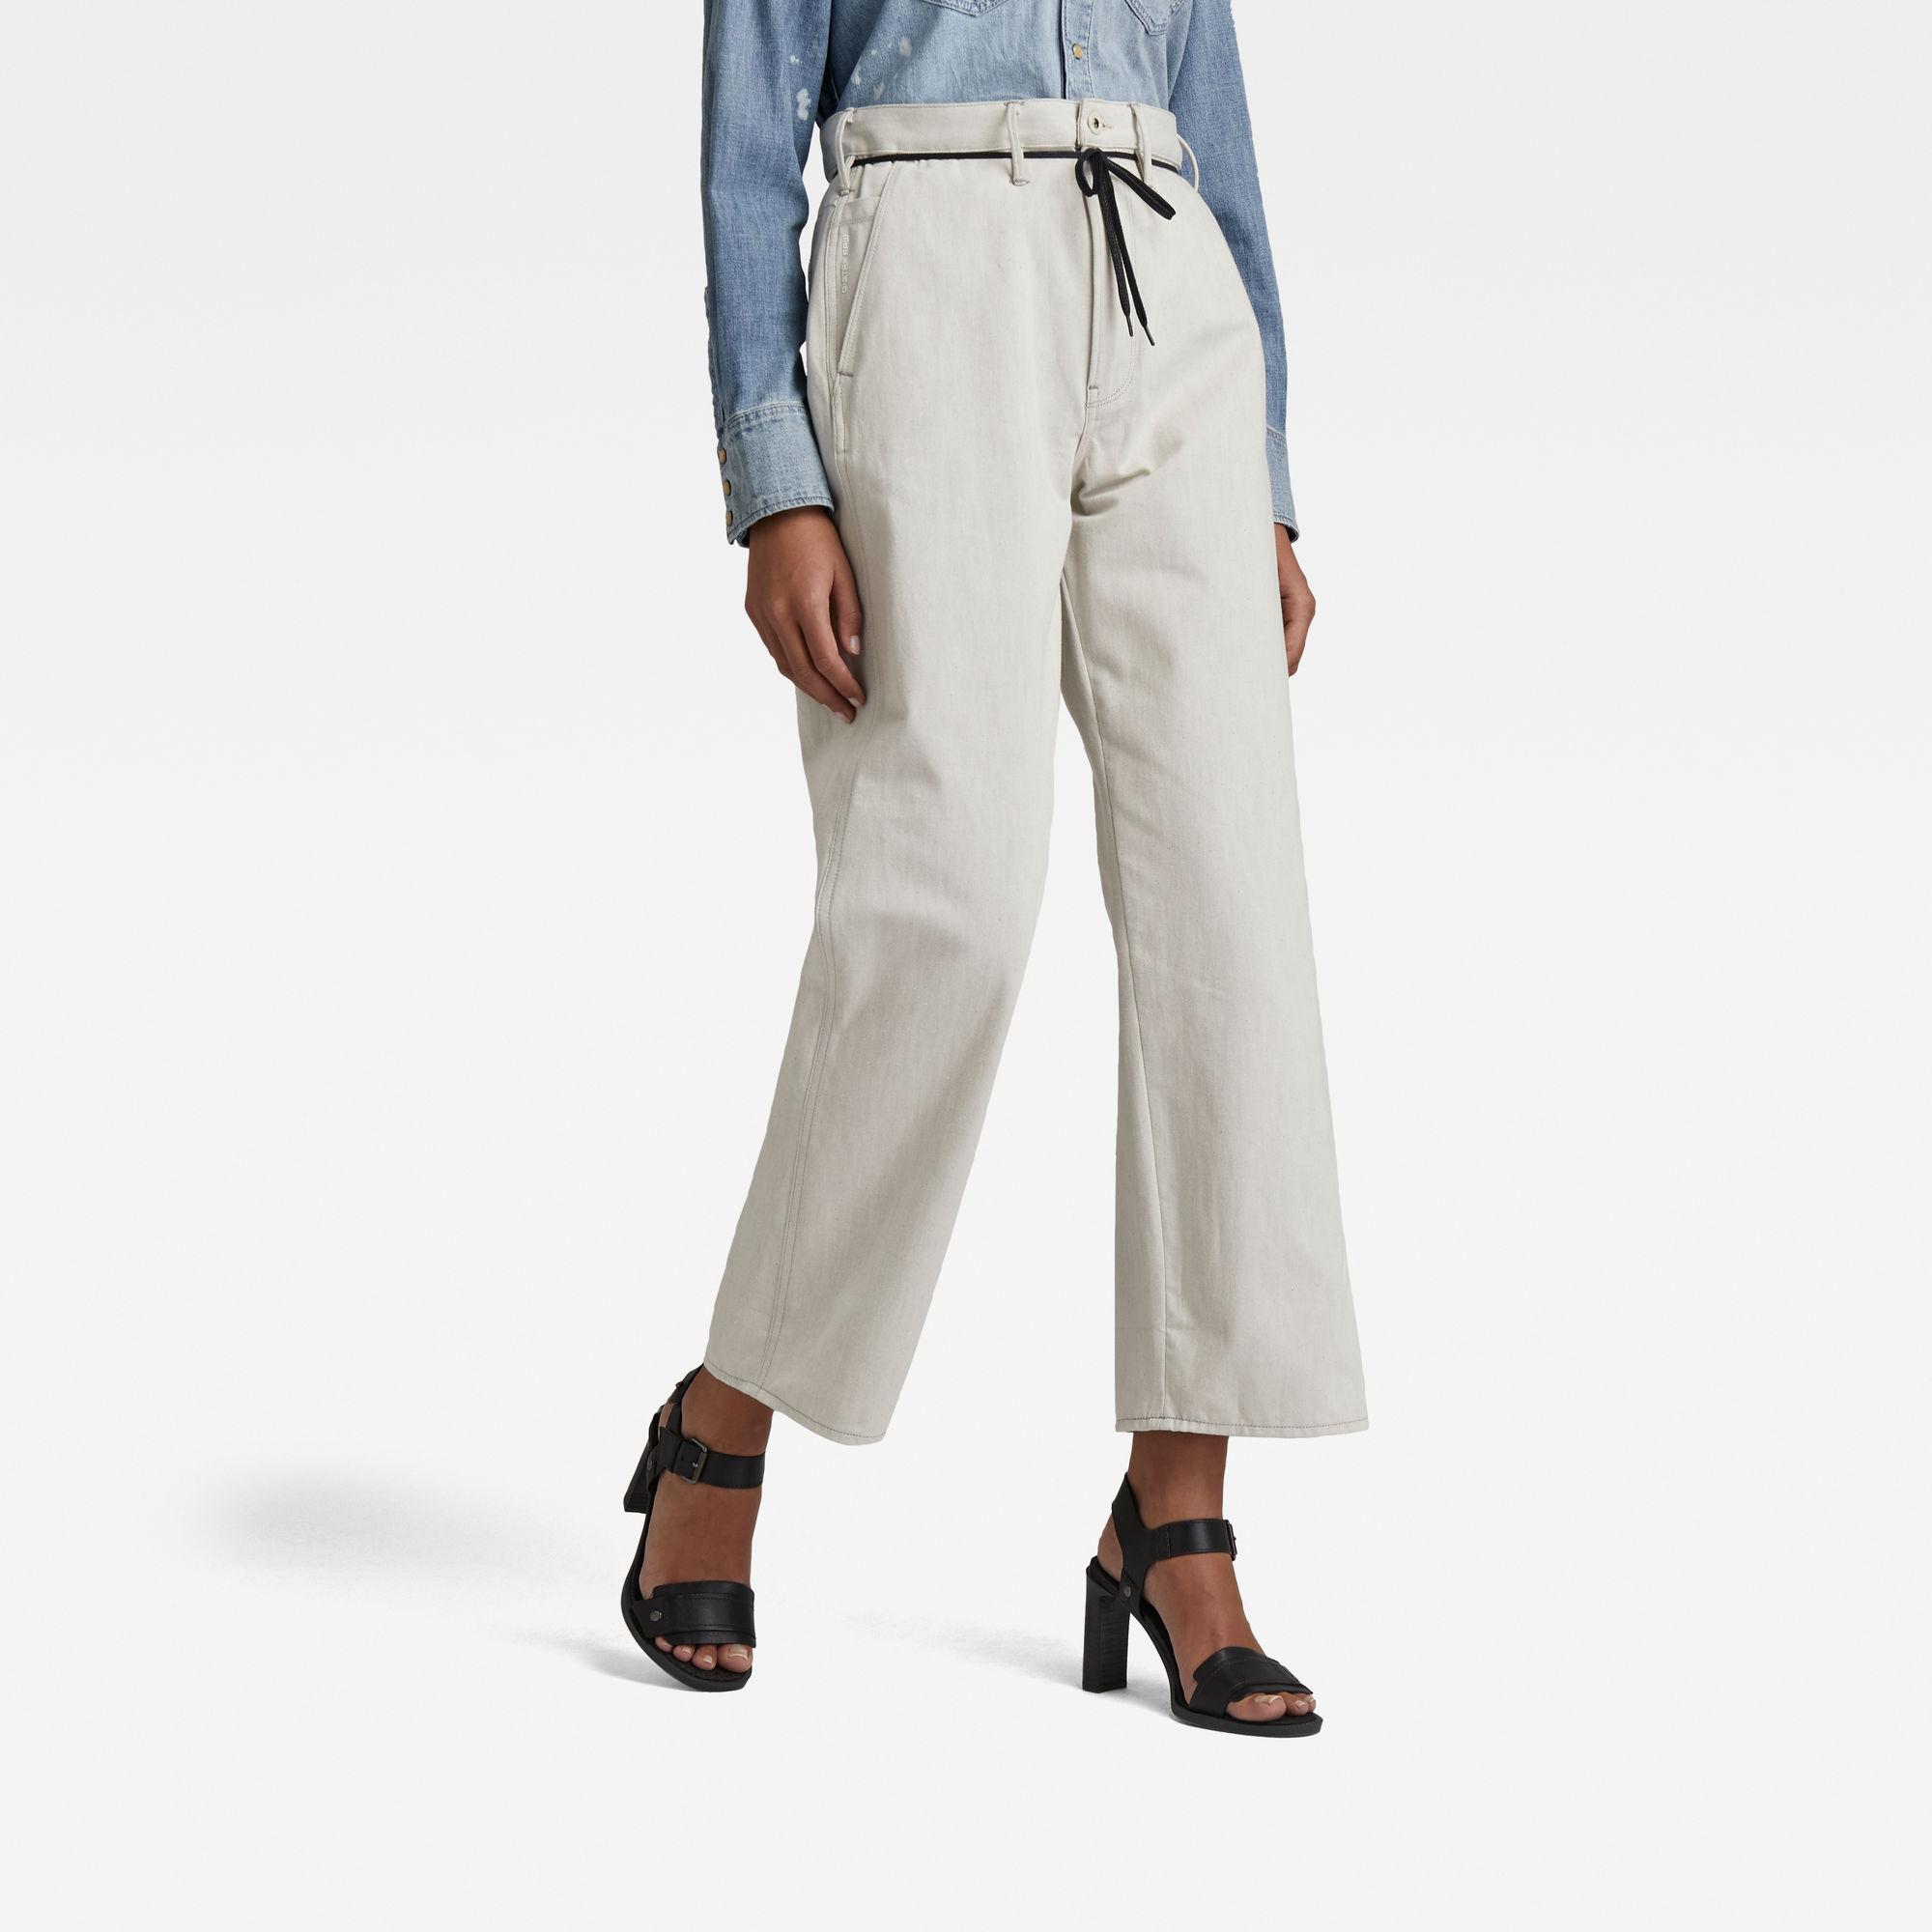 G-Star RAW Dames Lintell High Dad Jeans Beige